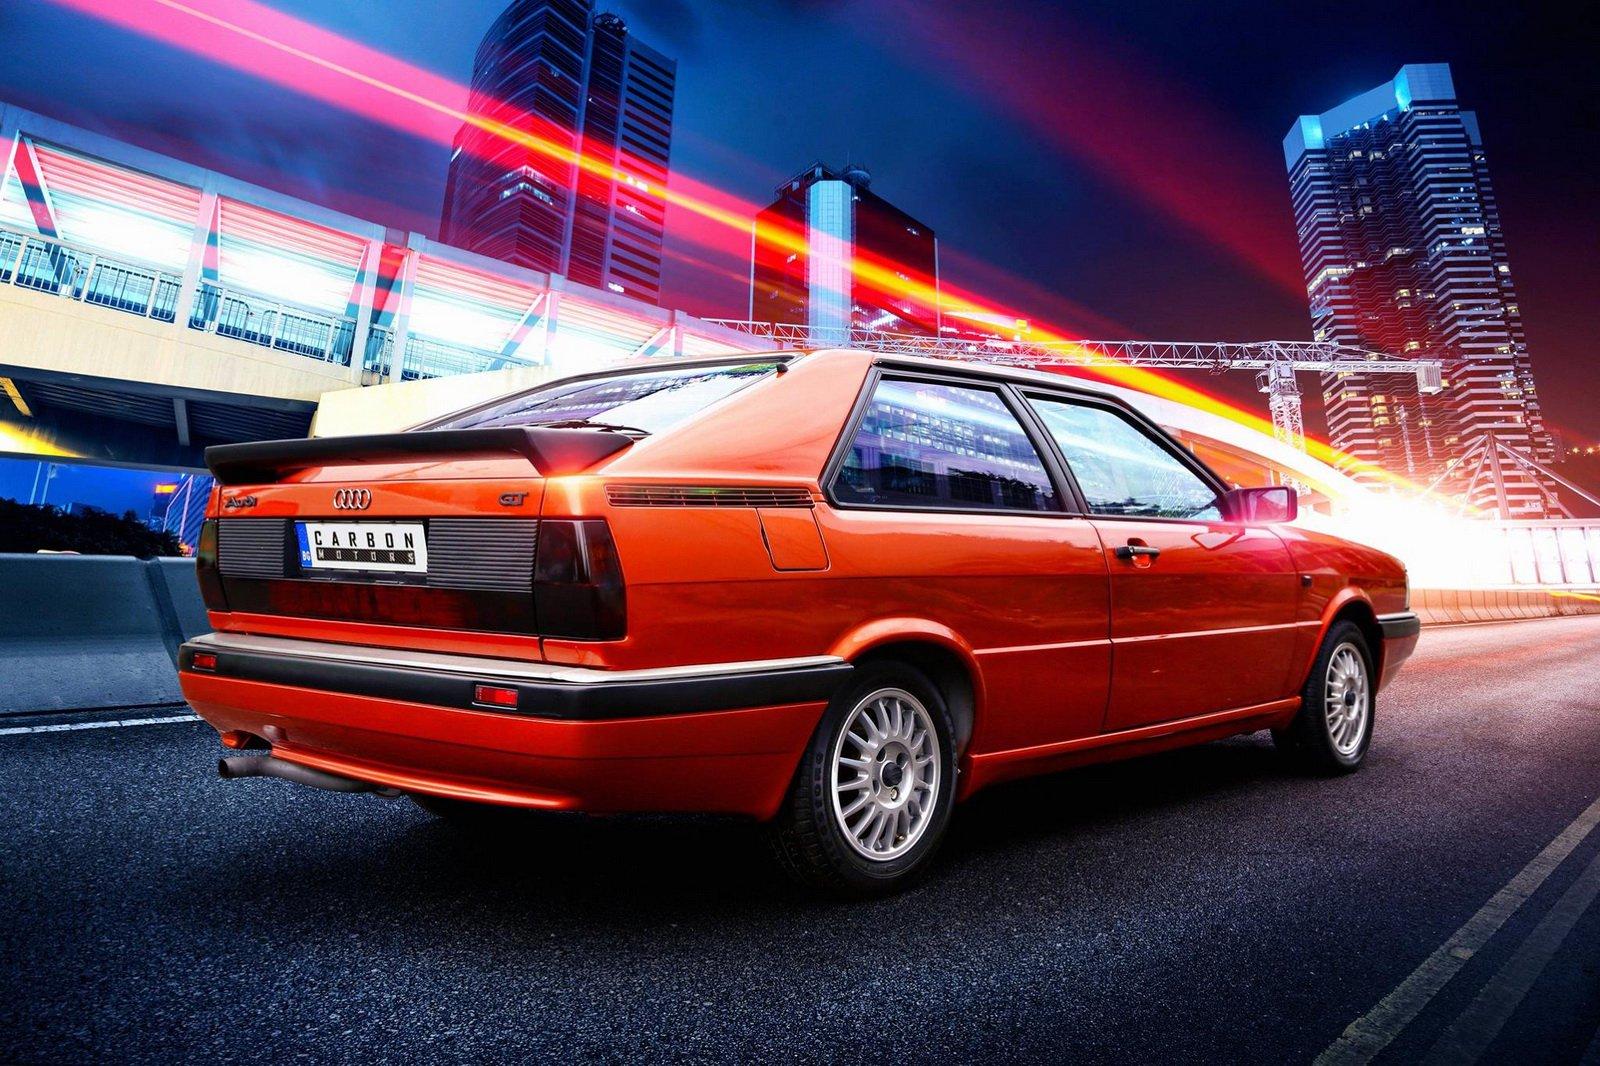 1477150885 audi coupe 19 - Carbon Motors преобразили интерьер Audi B2